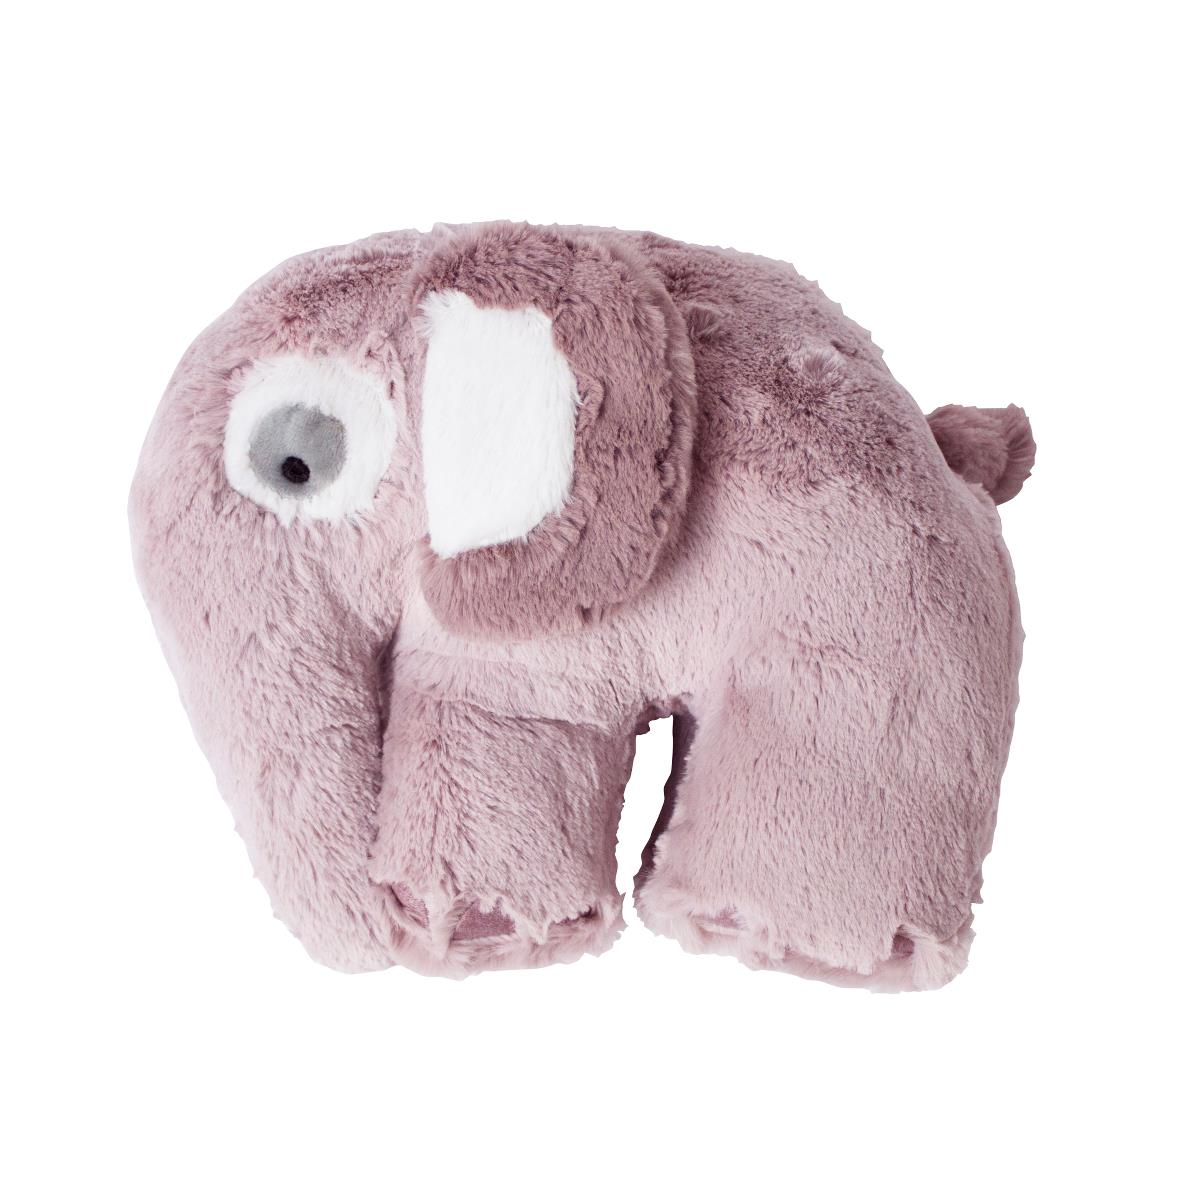 sebra Plüschtier, Elefant, altrosa 3001206 - 01